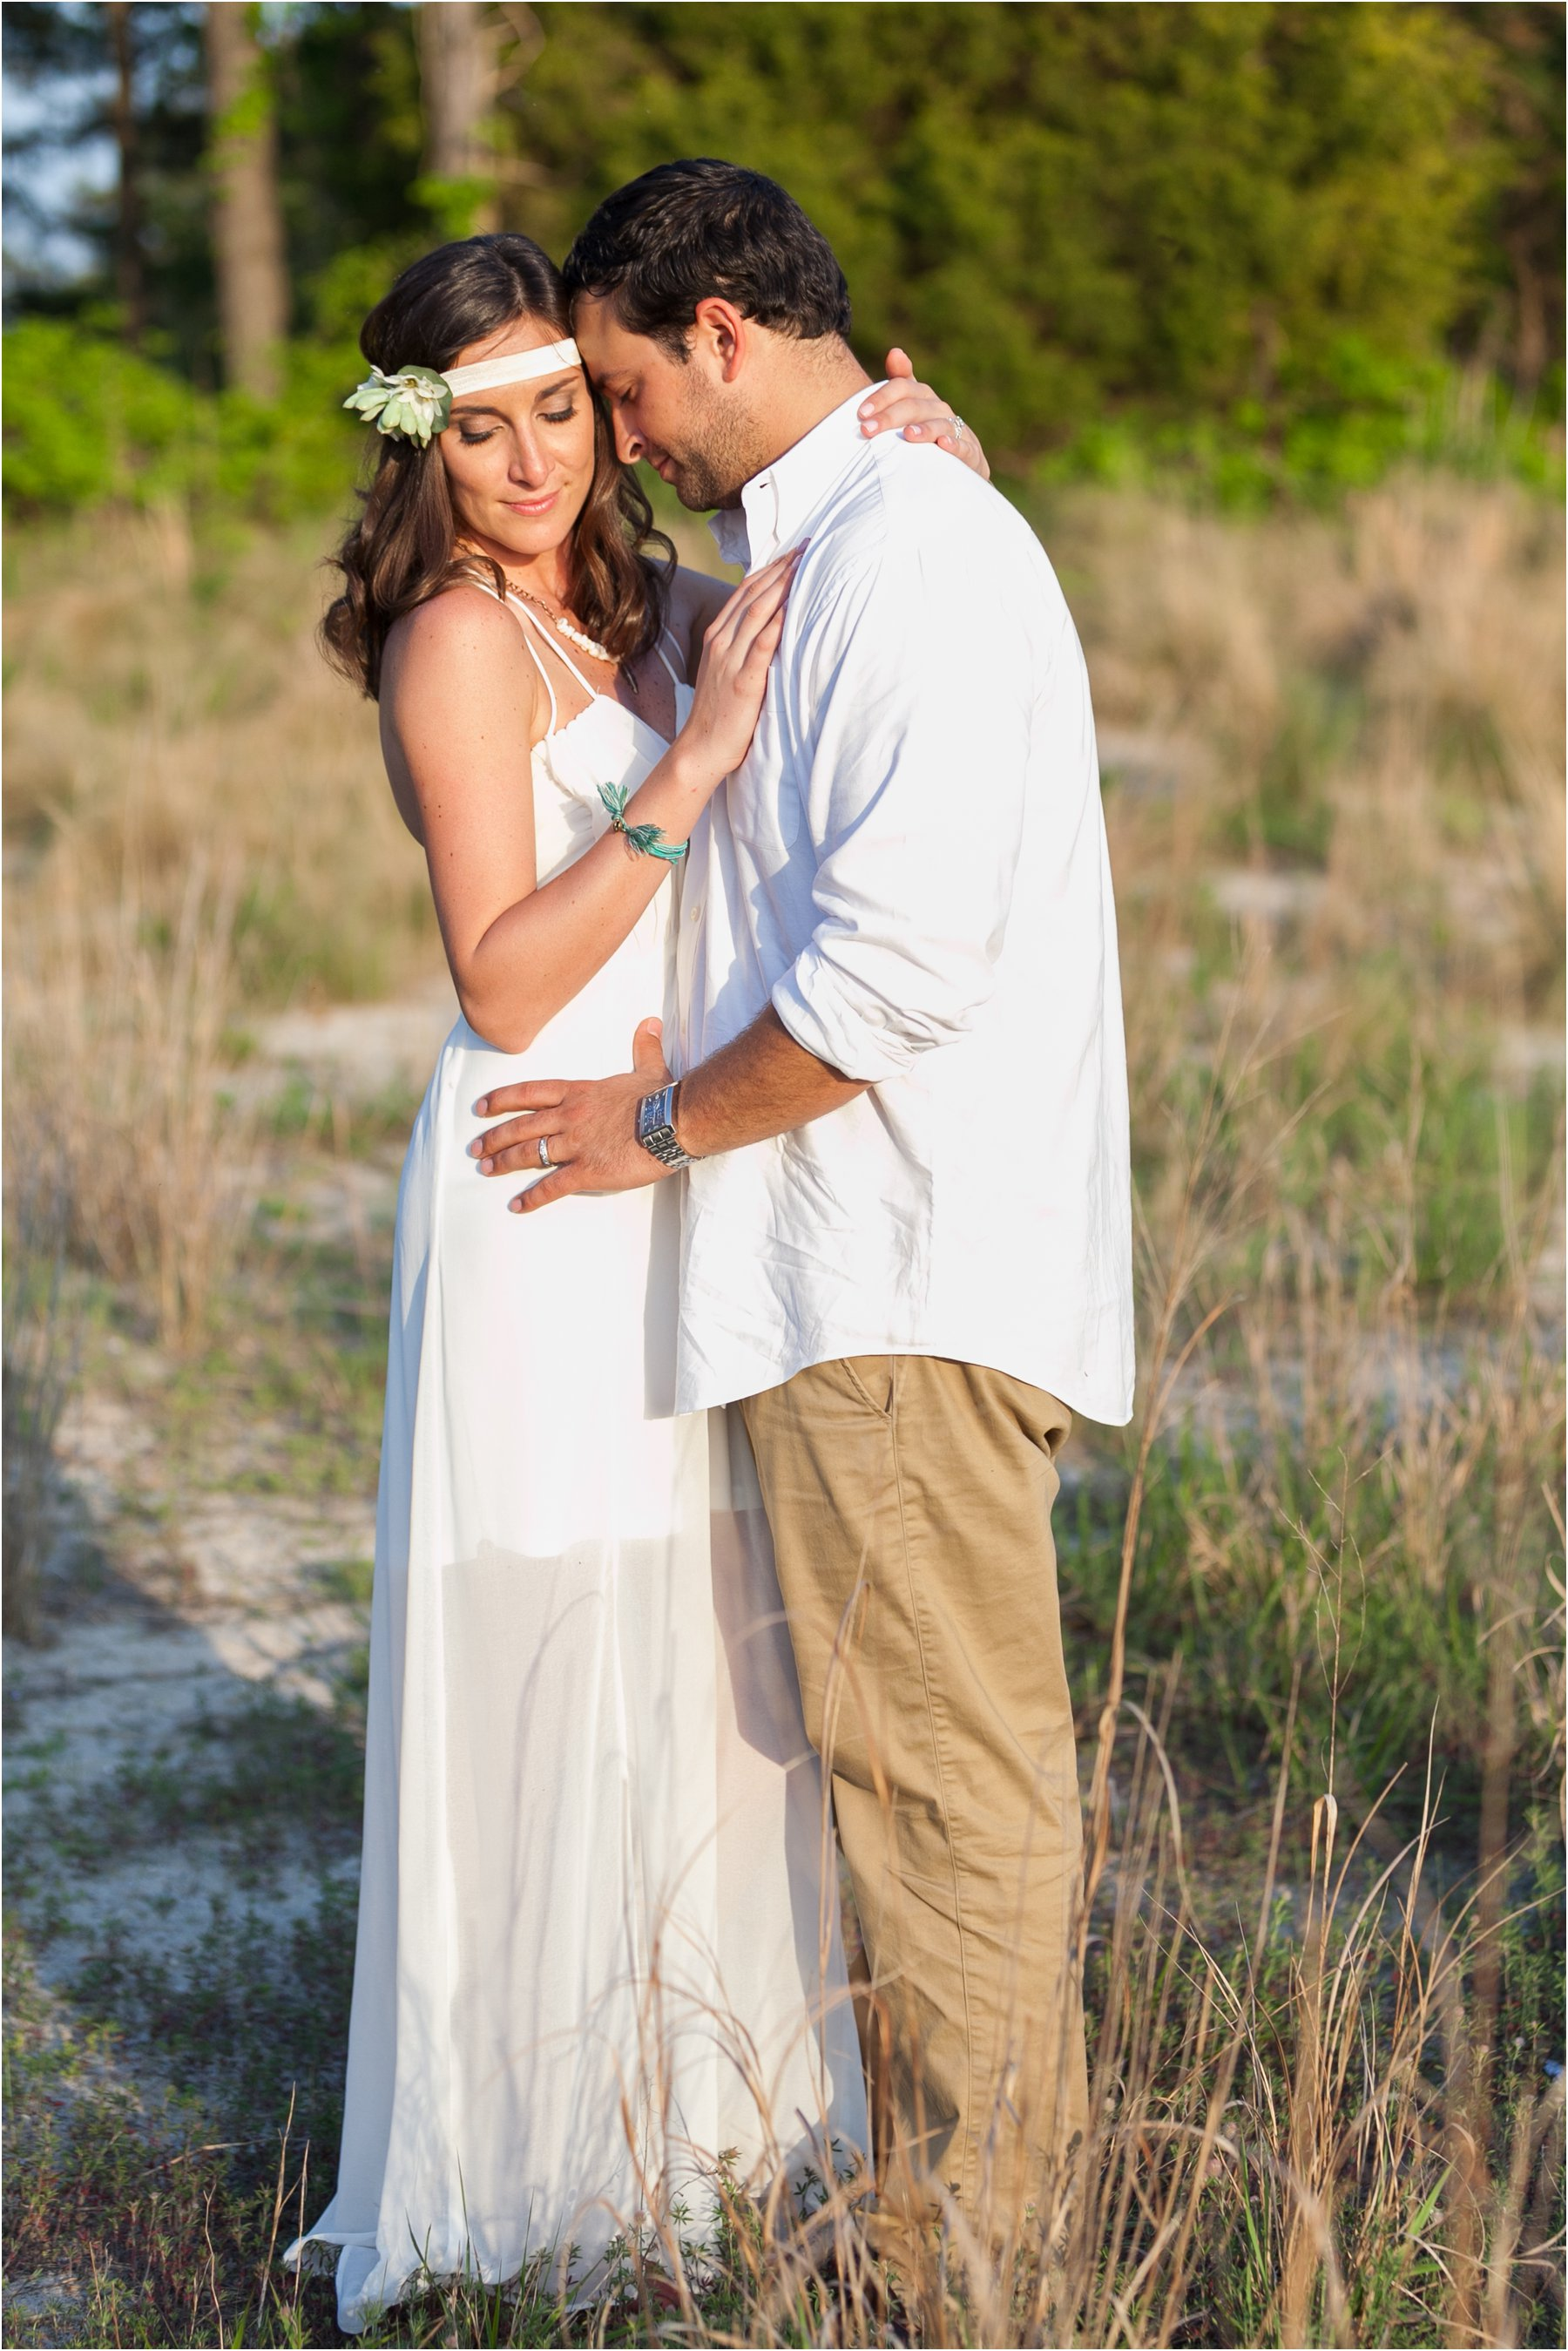 first_landing_wedding_boho_wedding_photography_virginia_Jessica_ryan_photography_0201